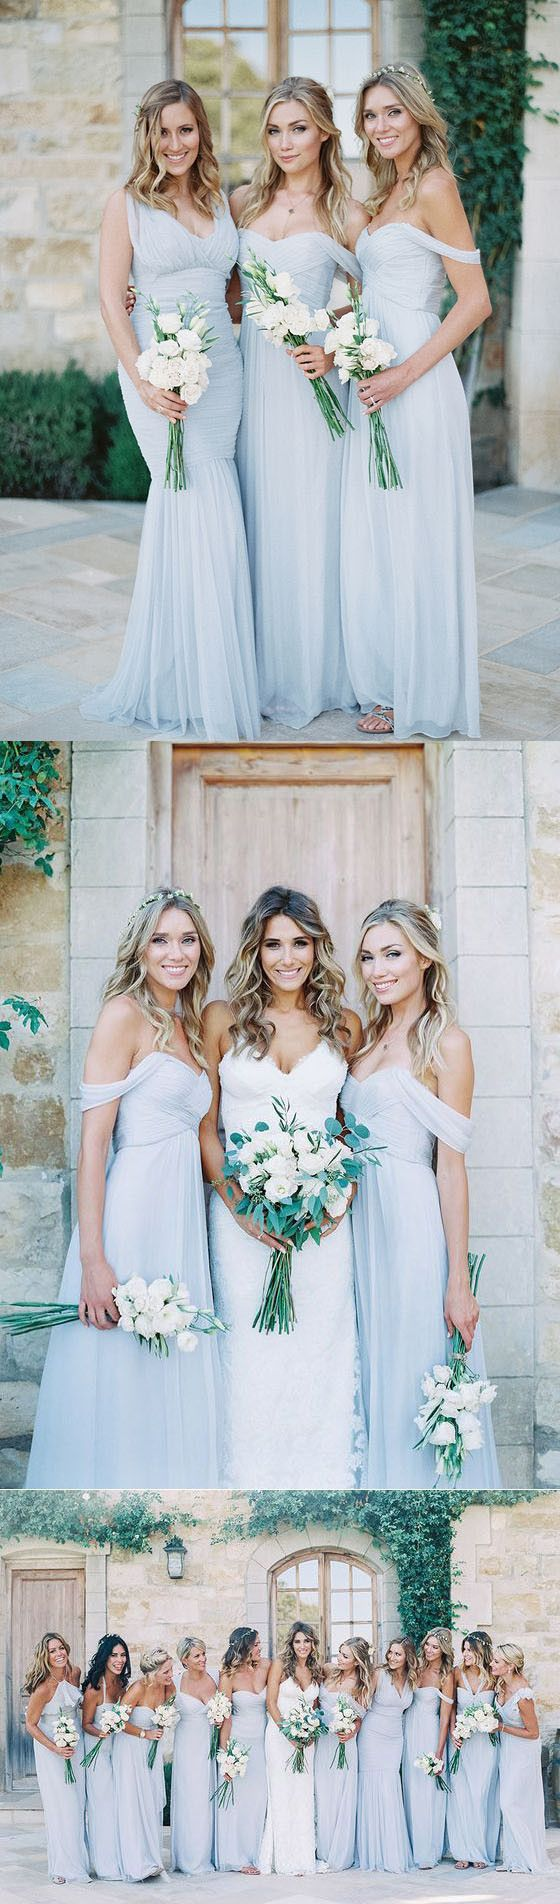 best wedding images on pinterest flower girls bridal and